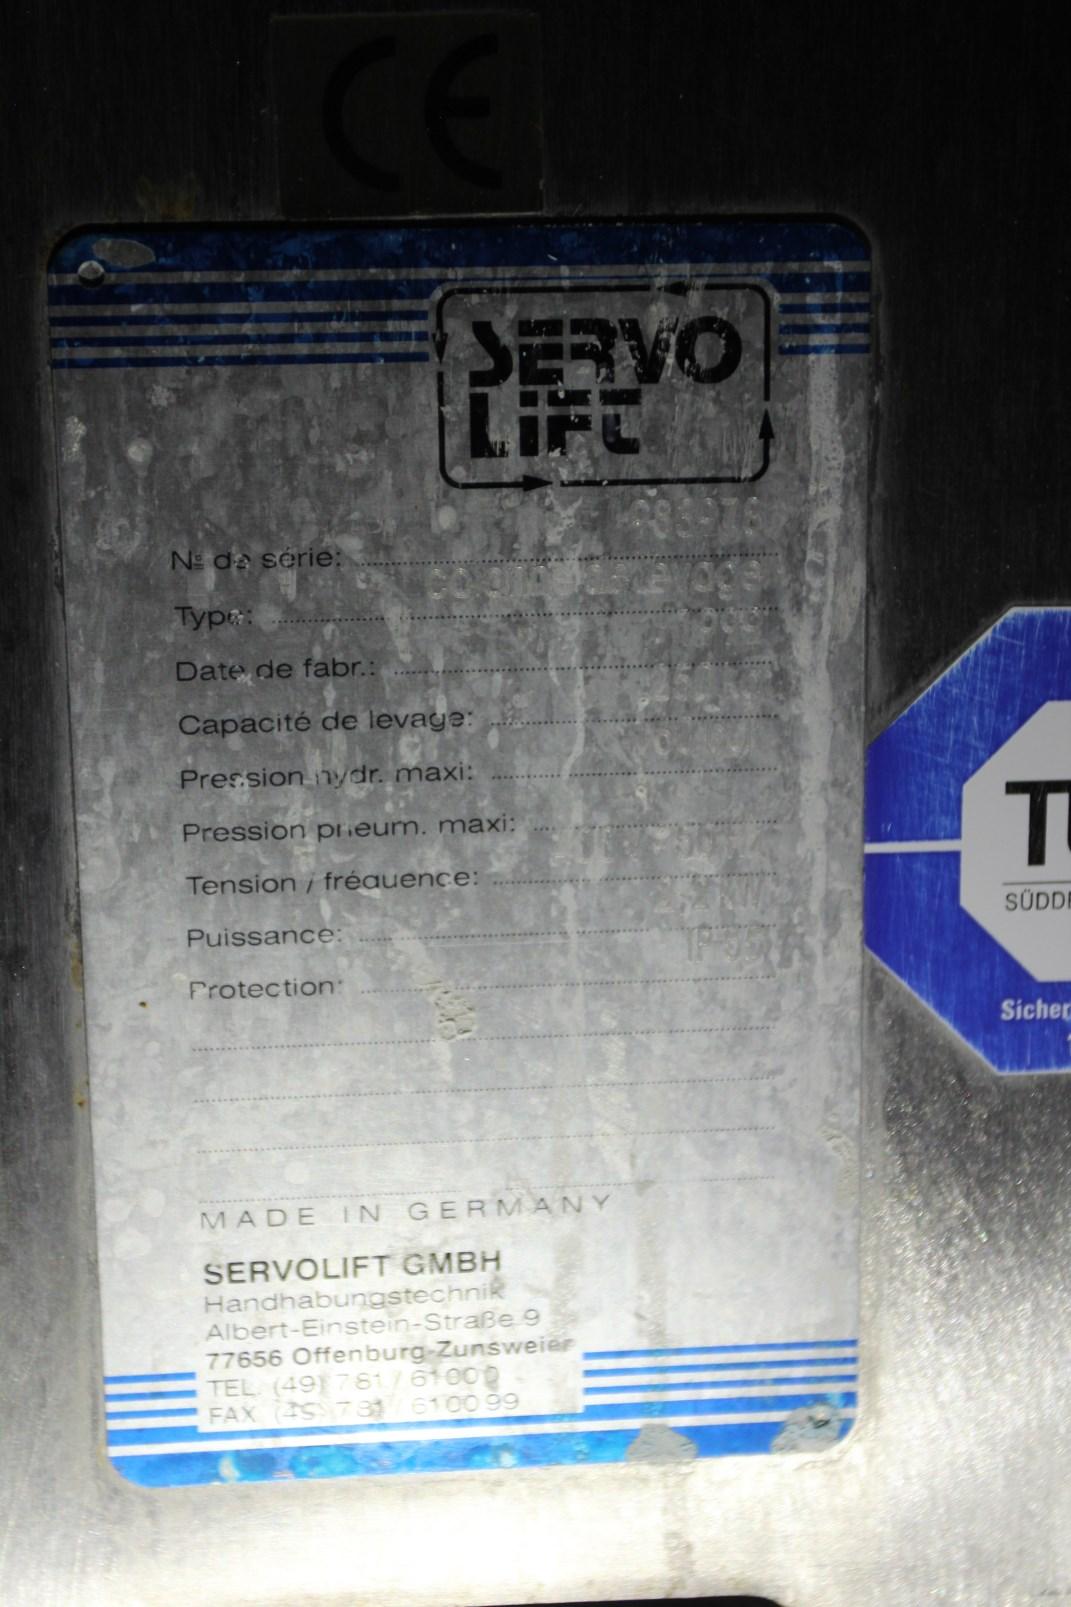 Lot 118 - 1999 Servo Lift Colonne de Levage (Lifting Column), s/n 983978, 250 kg Capacity, 160 bar Max Hyd